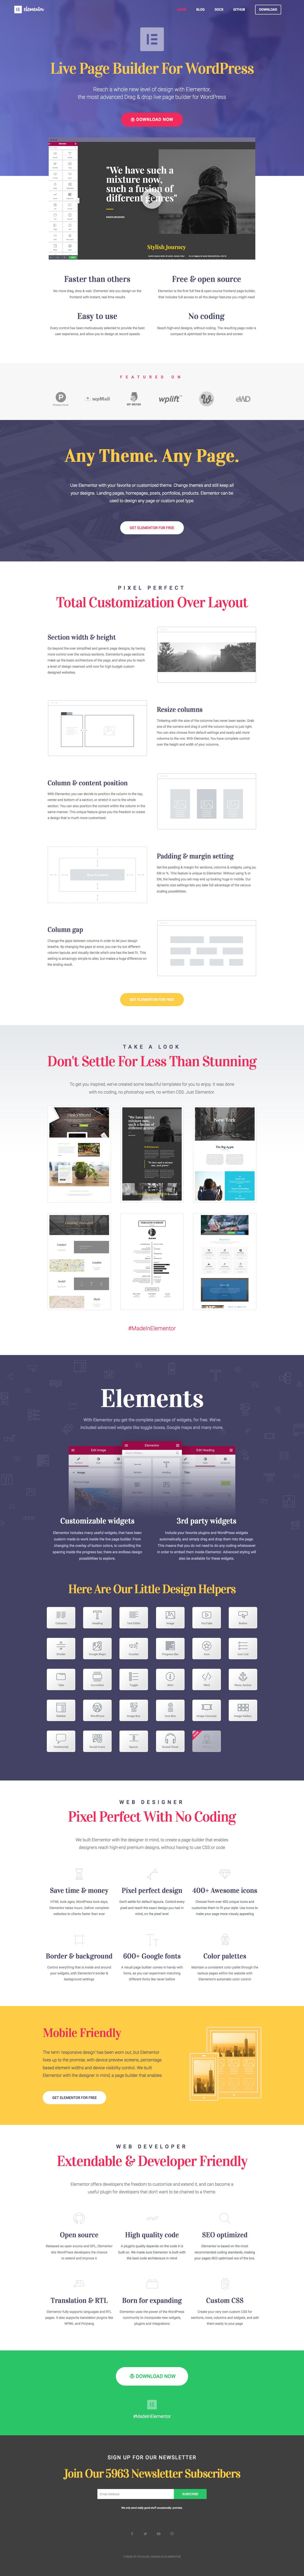 Elementor - One Page Website Award